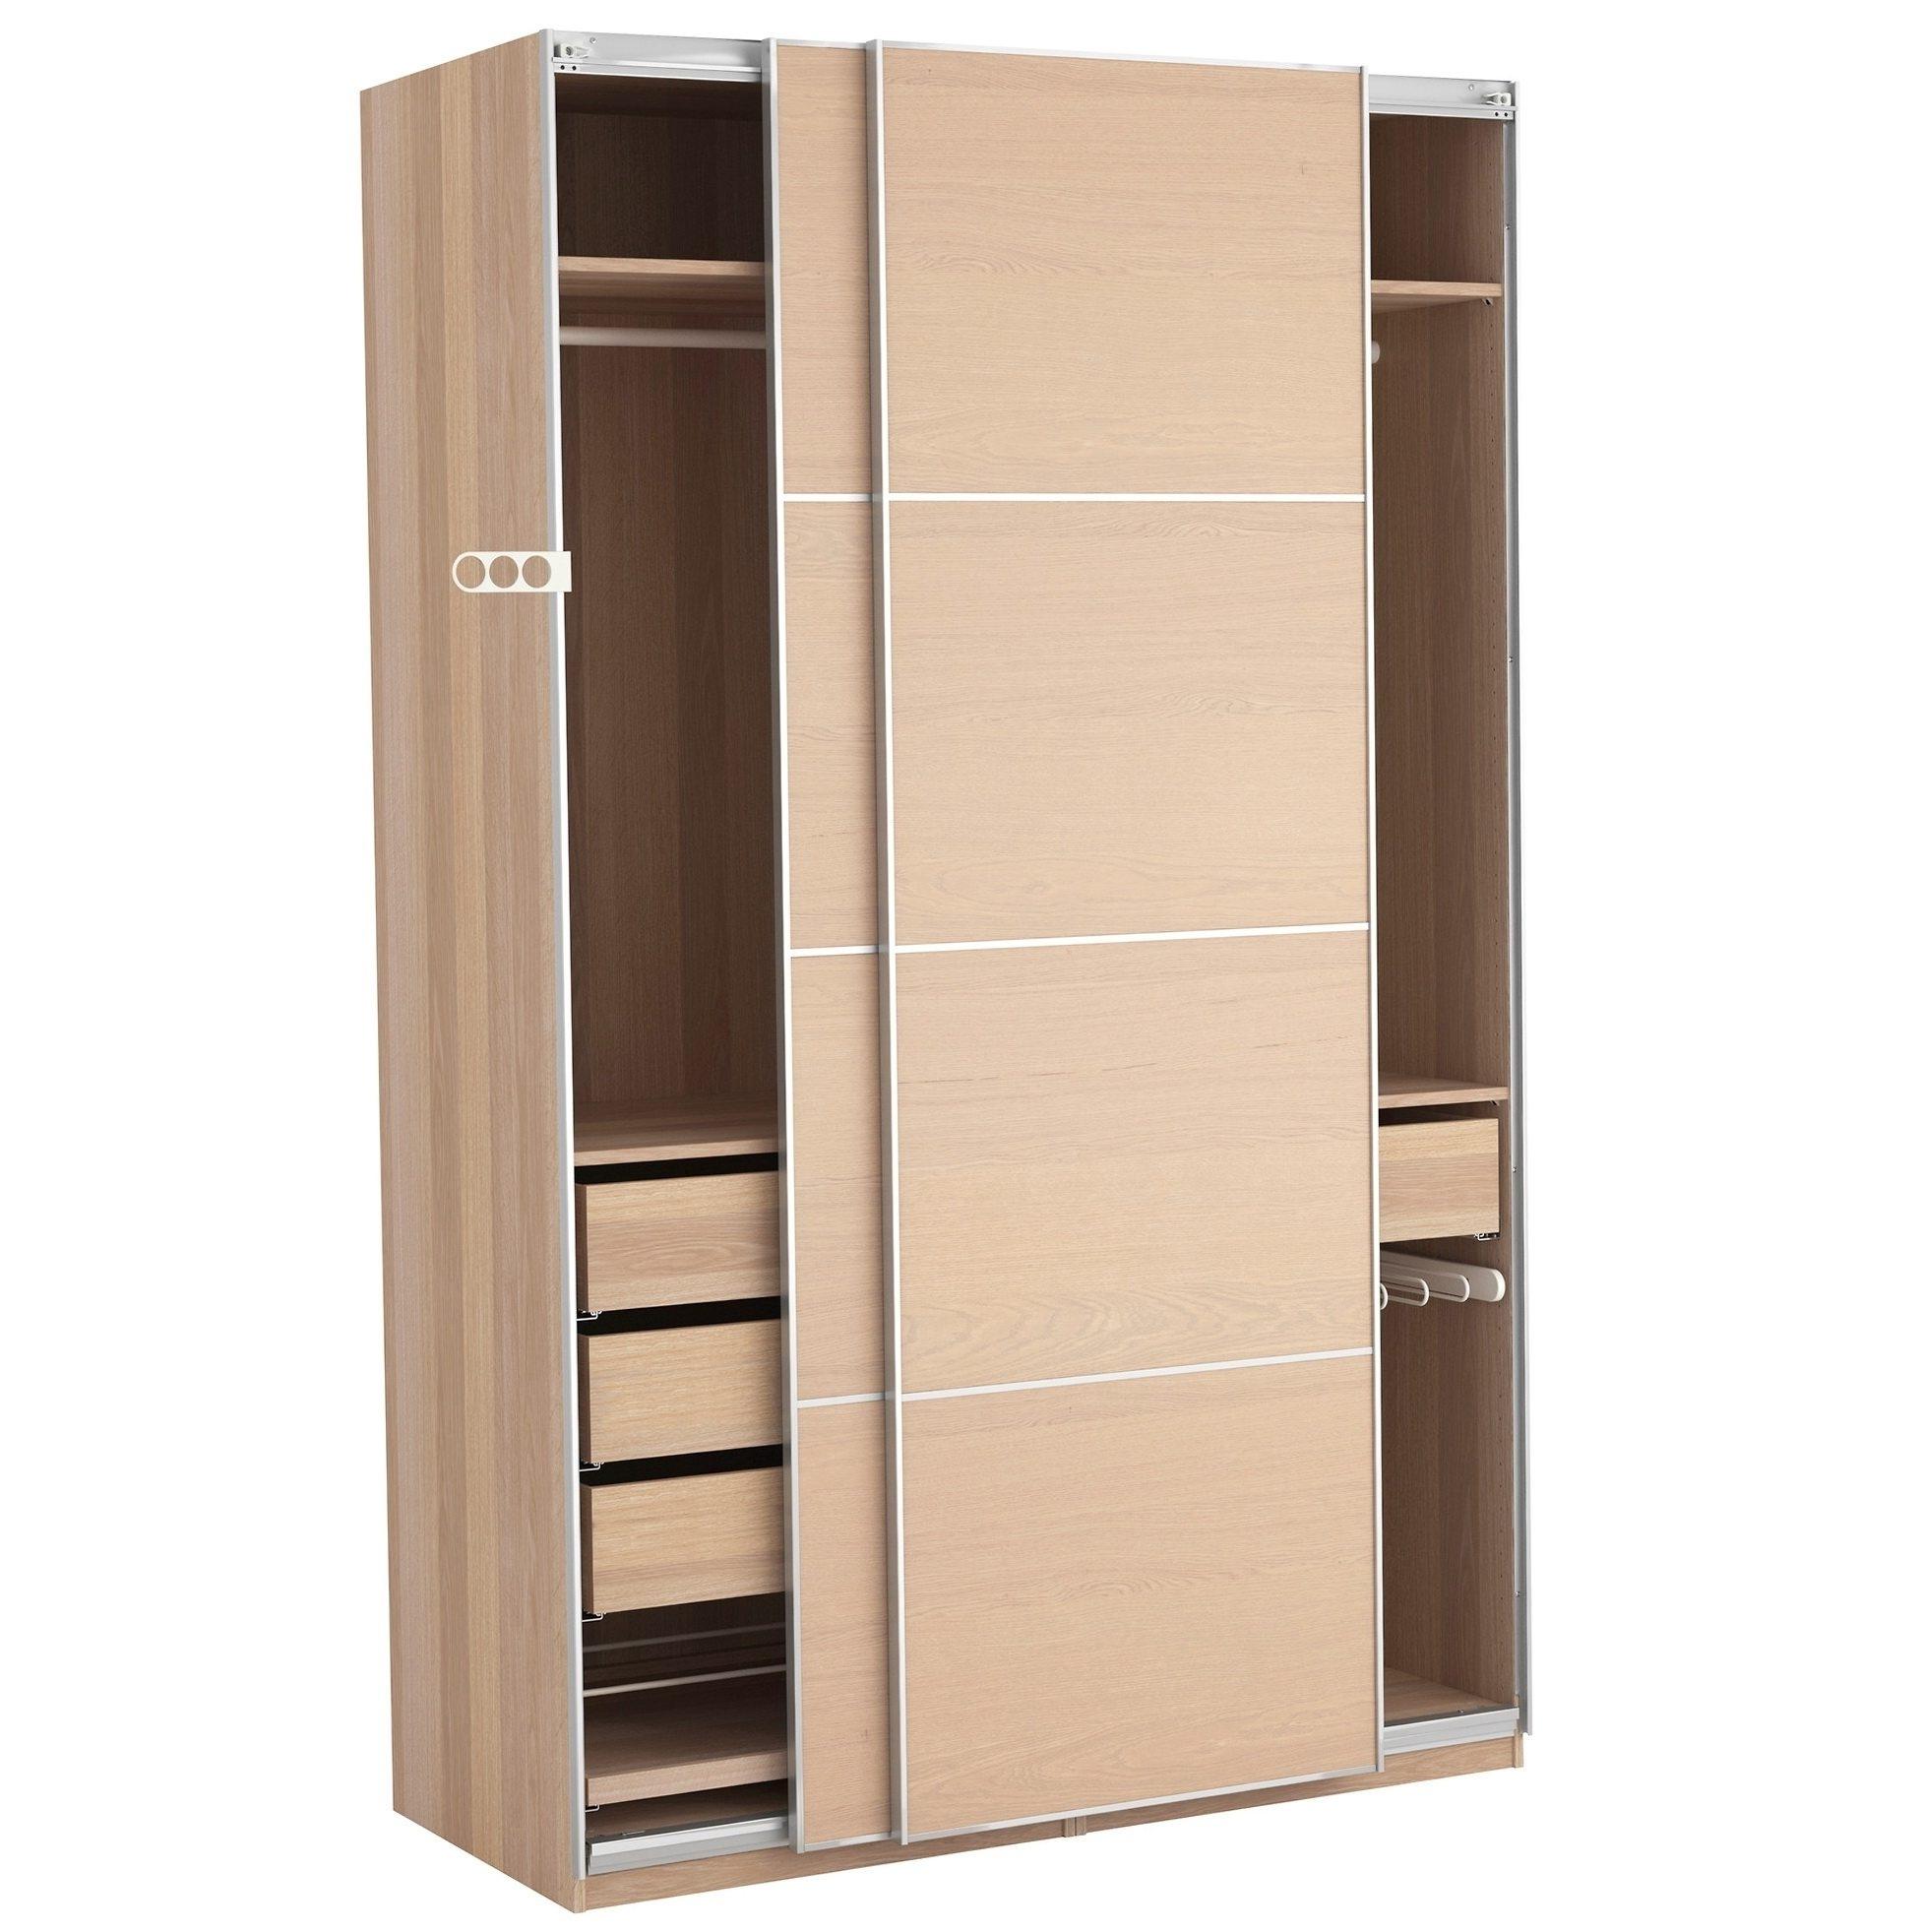 Portable Closet System, Portable Closet Storage Villaran Rodrigo Within On The Go With A Portable Wardrobe Closet (View 8 of 27)